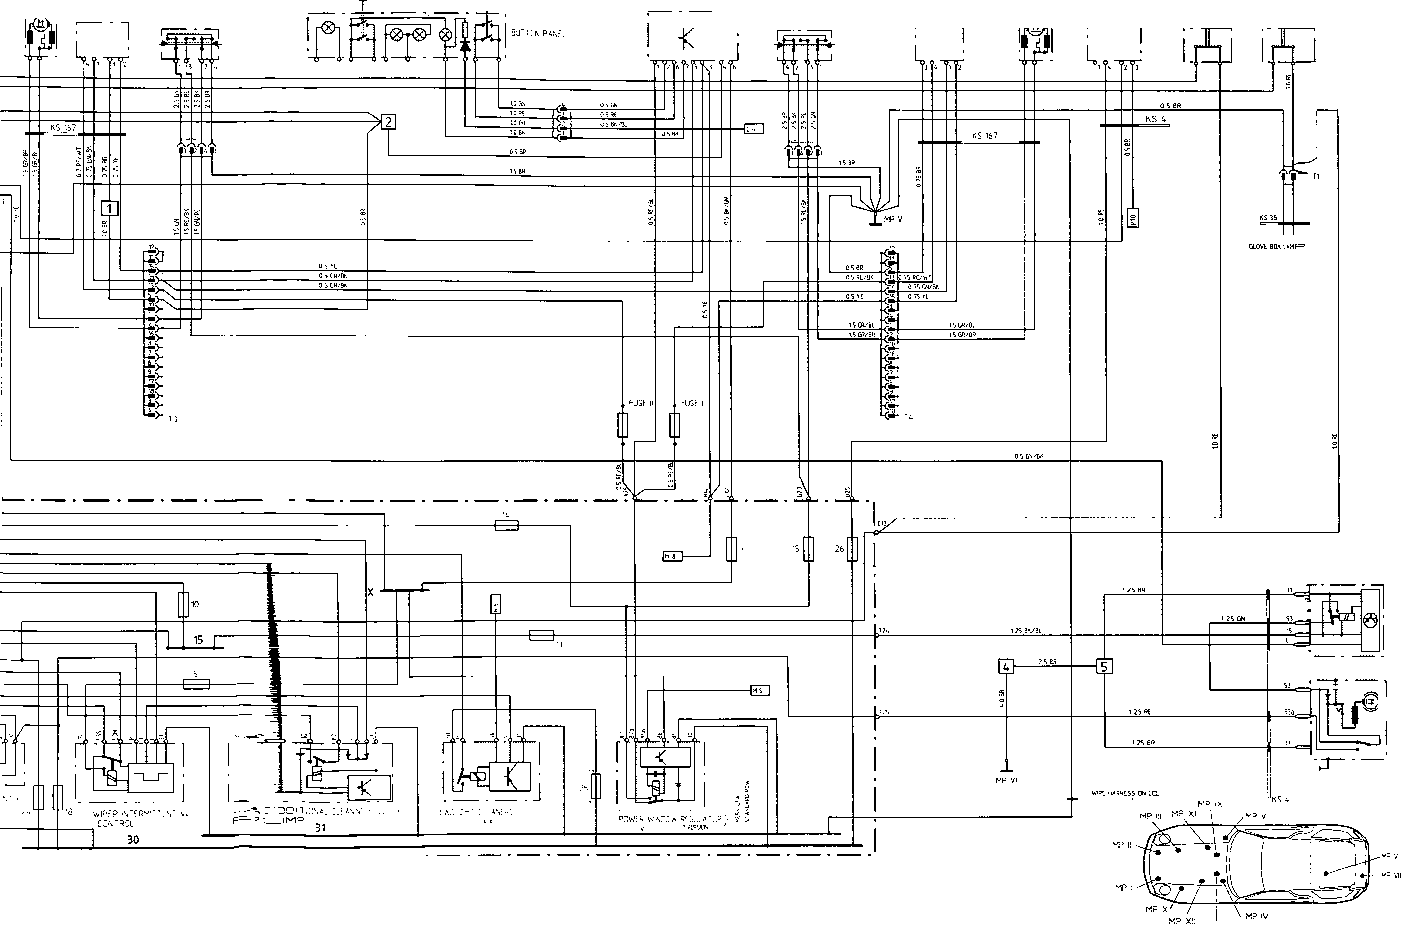 Fabulous 1983 Porsche 928S Wiring Diagram Wiring Diagram Database Wiring Cloud Staixaidewilluminateatxorg